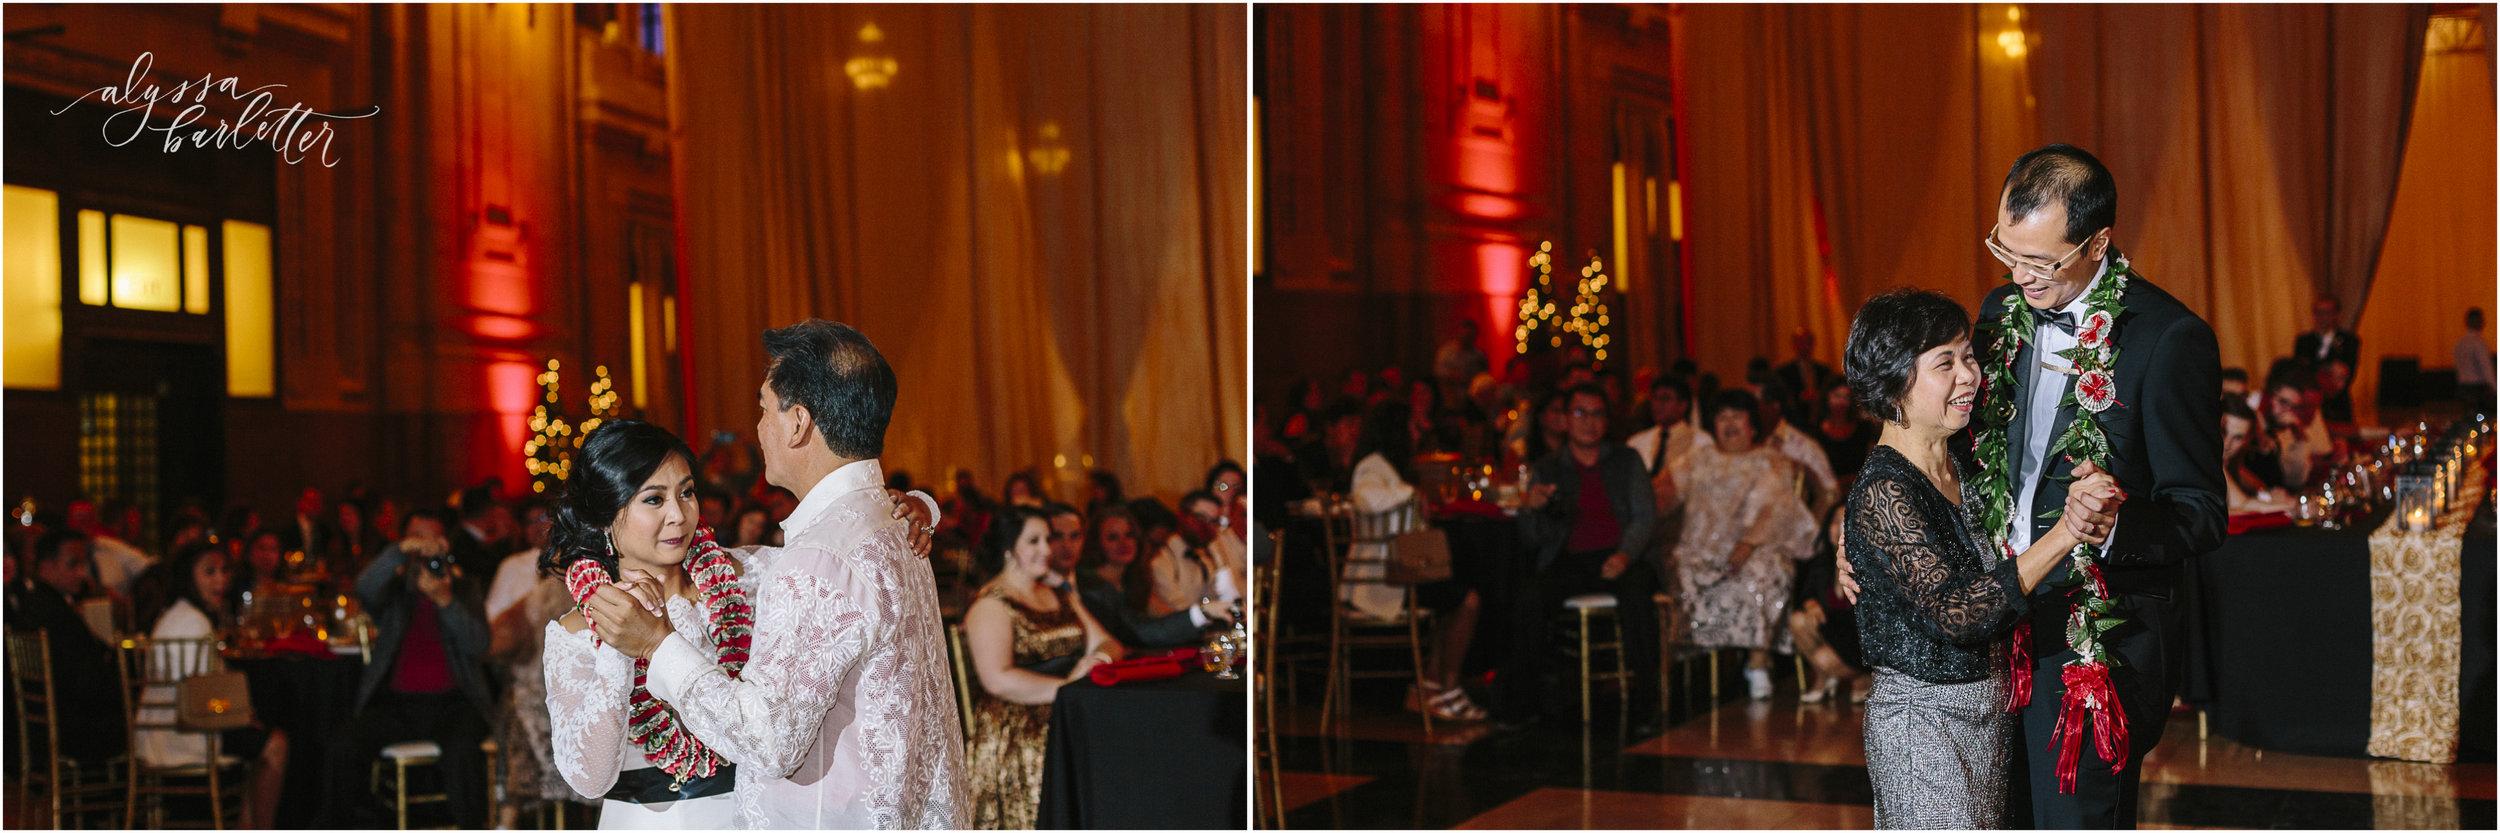 alyssa barletter photography union station wedding photos leopard print winter wedding-1-54.jpg